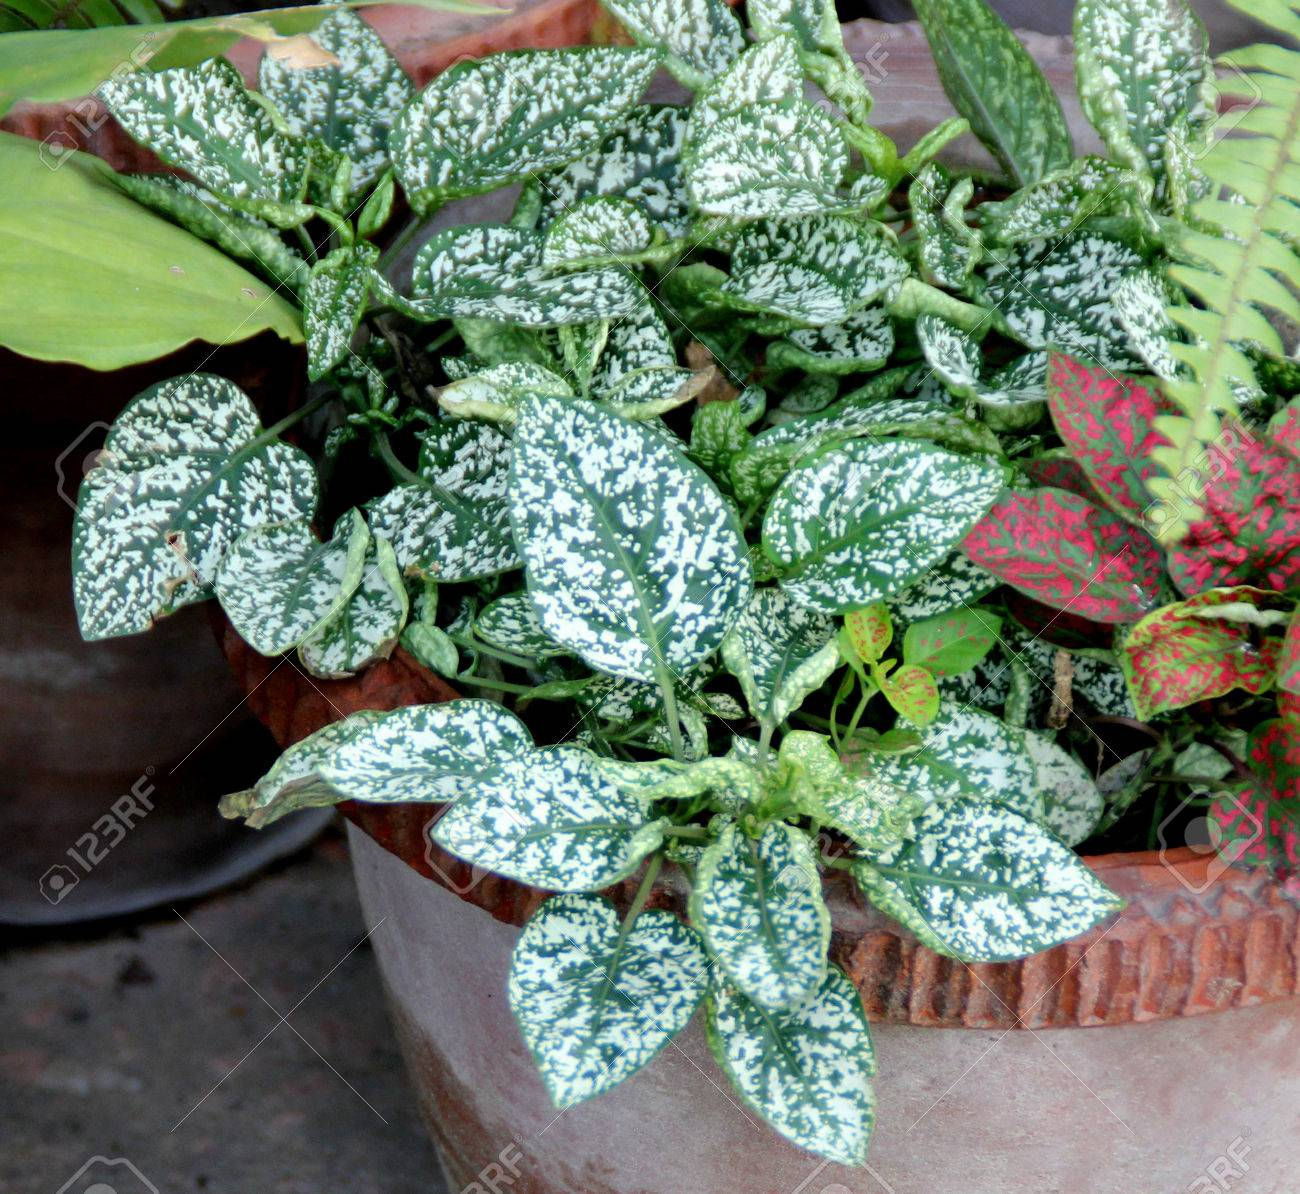 Hypoestes Phyllostachya Polka Dot Plant Ornamental Herbaceous